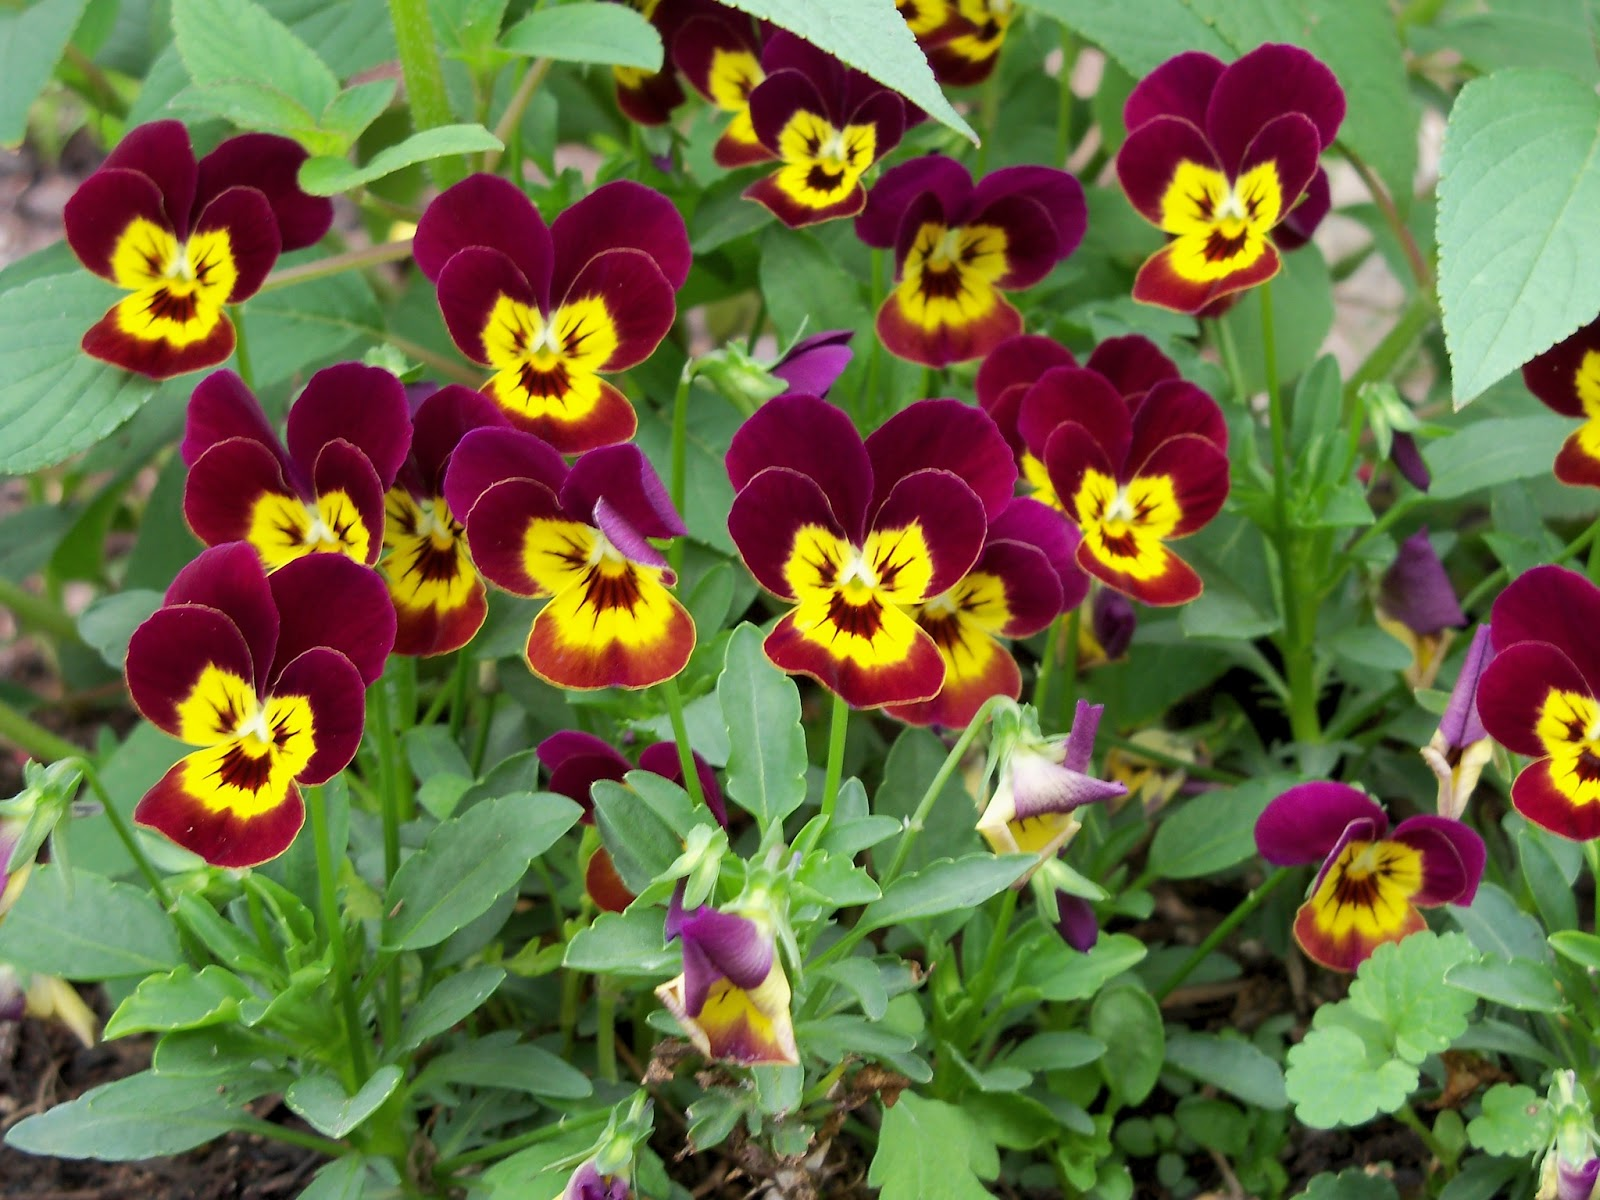 Gardening 2011 - 100_7414.JPG